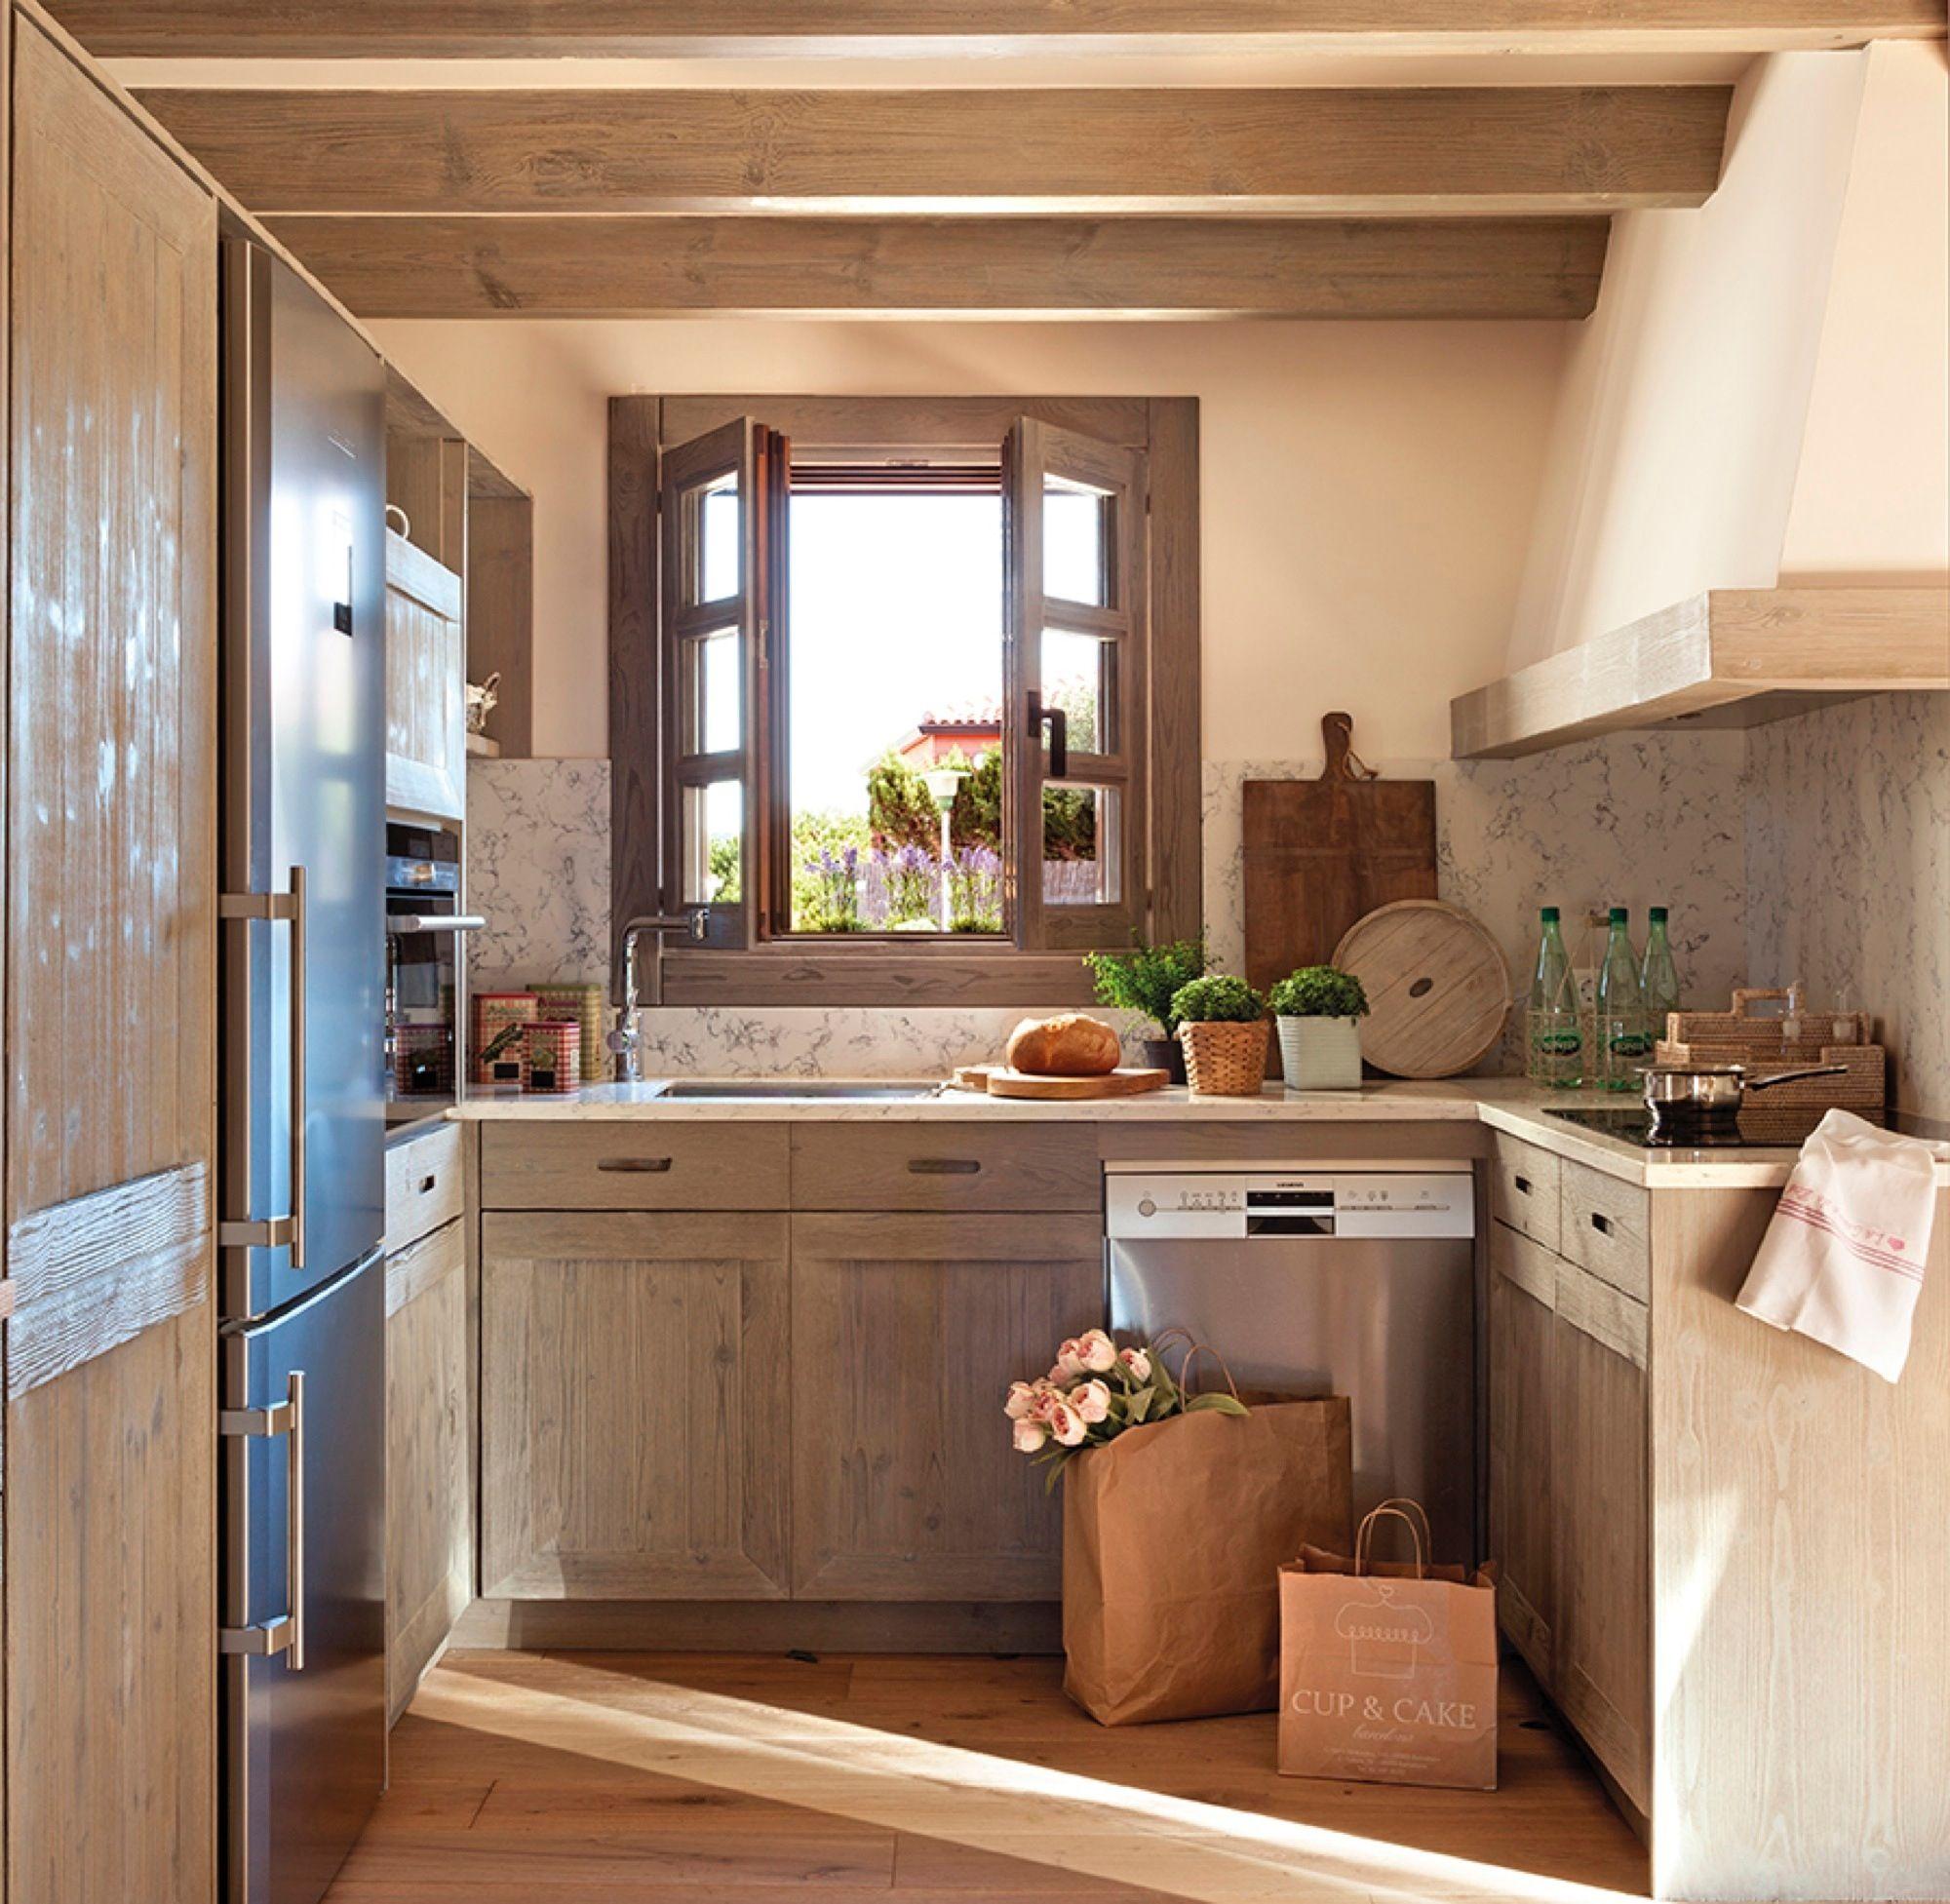 10 fotos de cocinas peque as bien aprovechadas cocinas - Ideas para cocinas pequenas ...